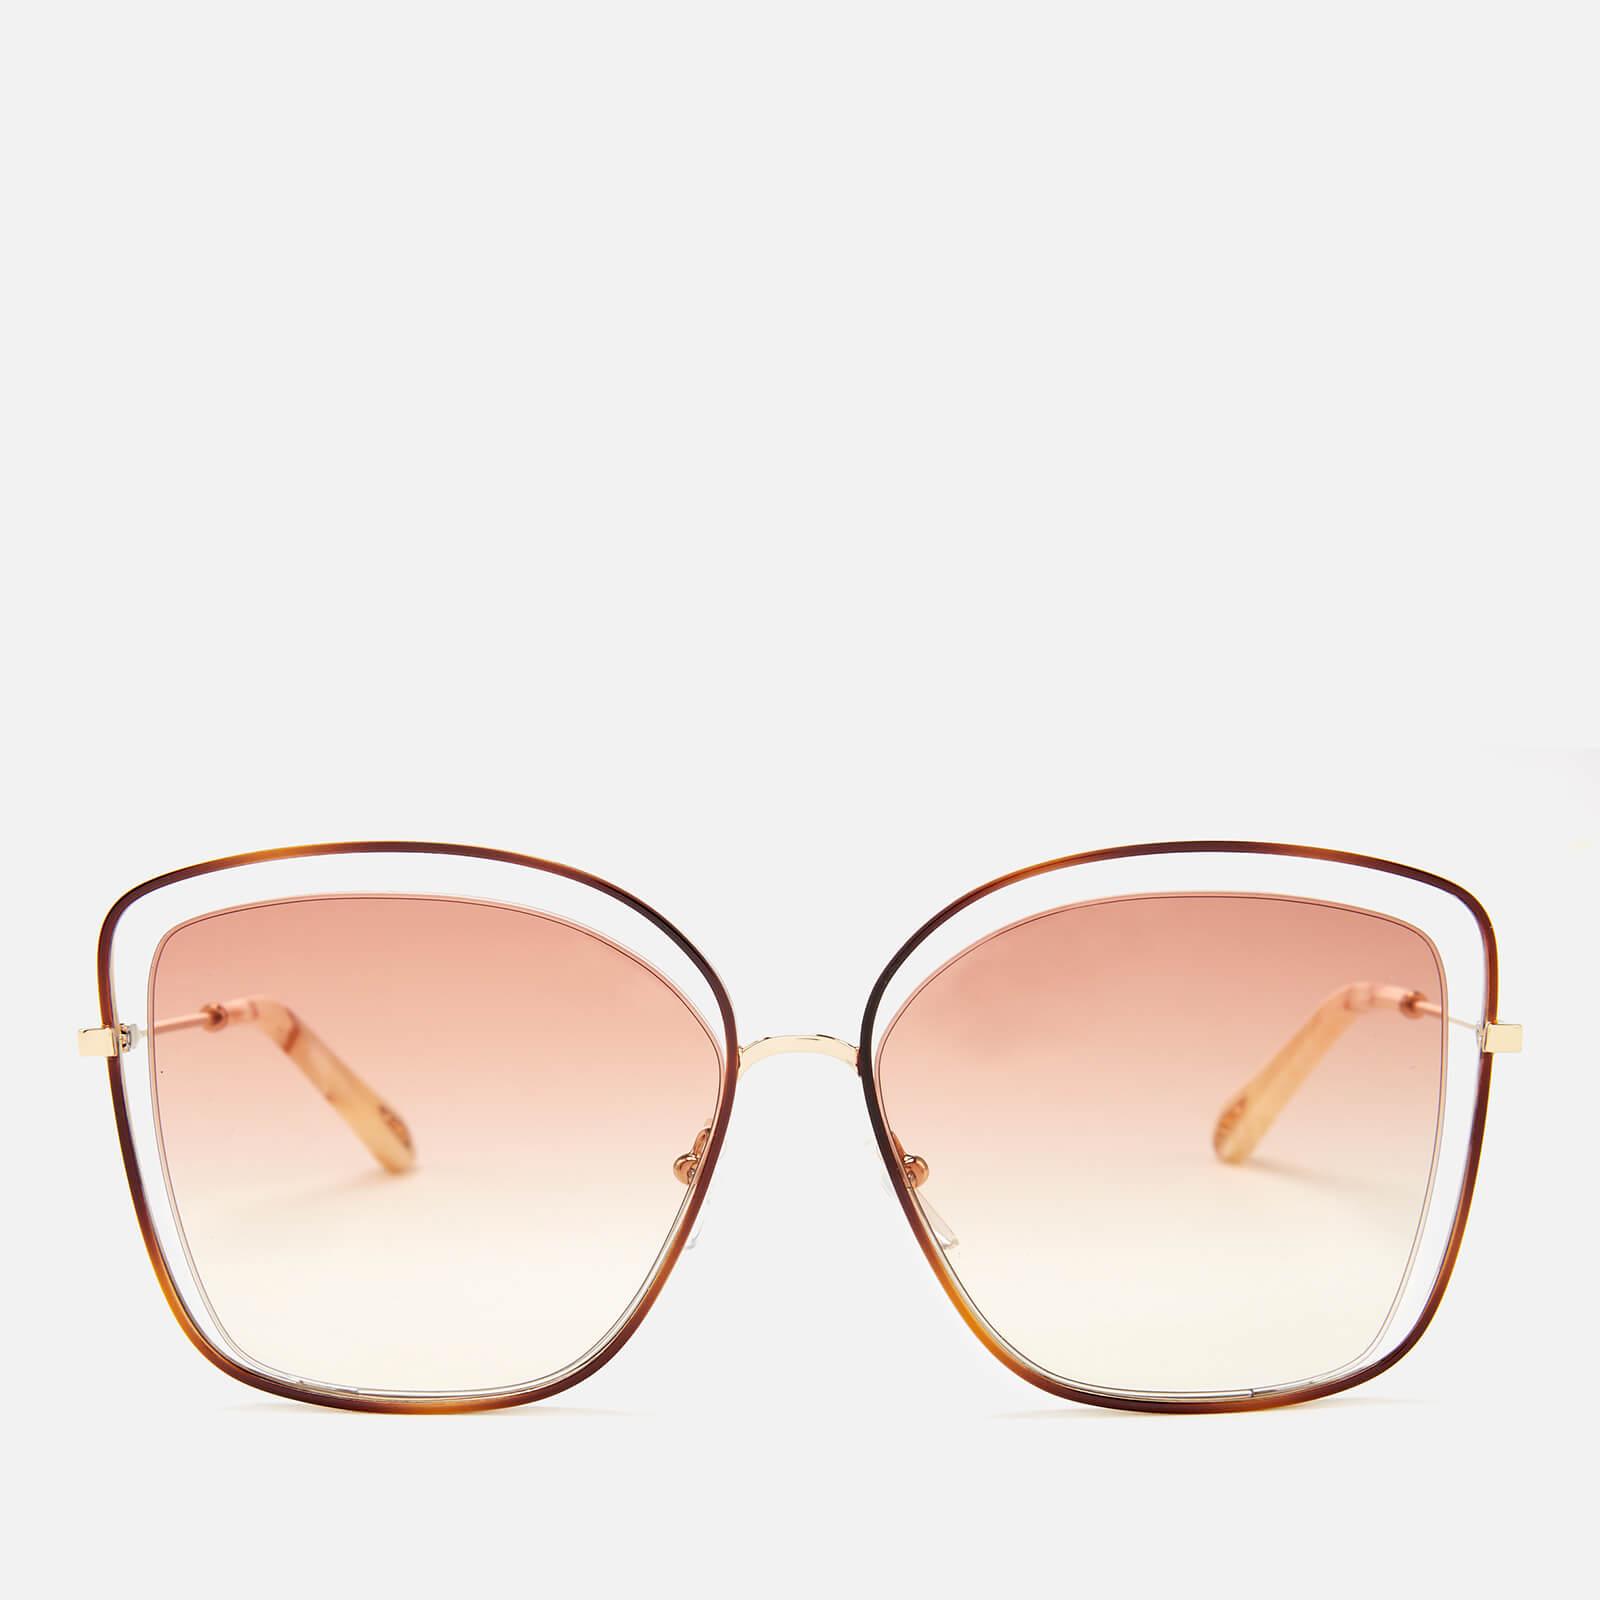 e908a00333 Chloe Women s Poppy Sunglasses - Havanna Peach - Free UK Delivery over £50